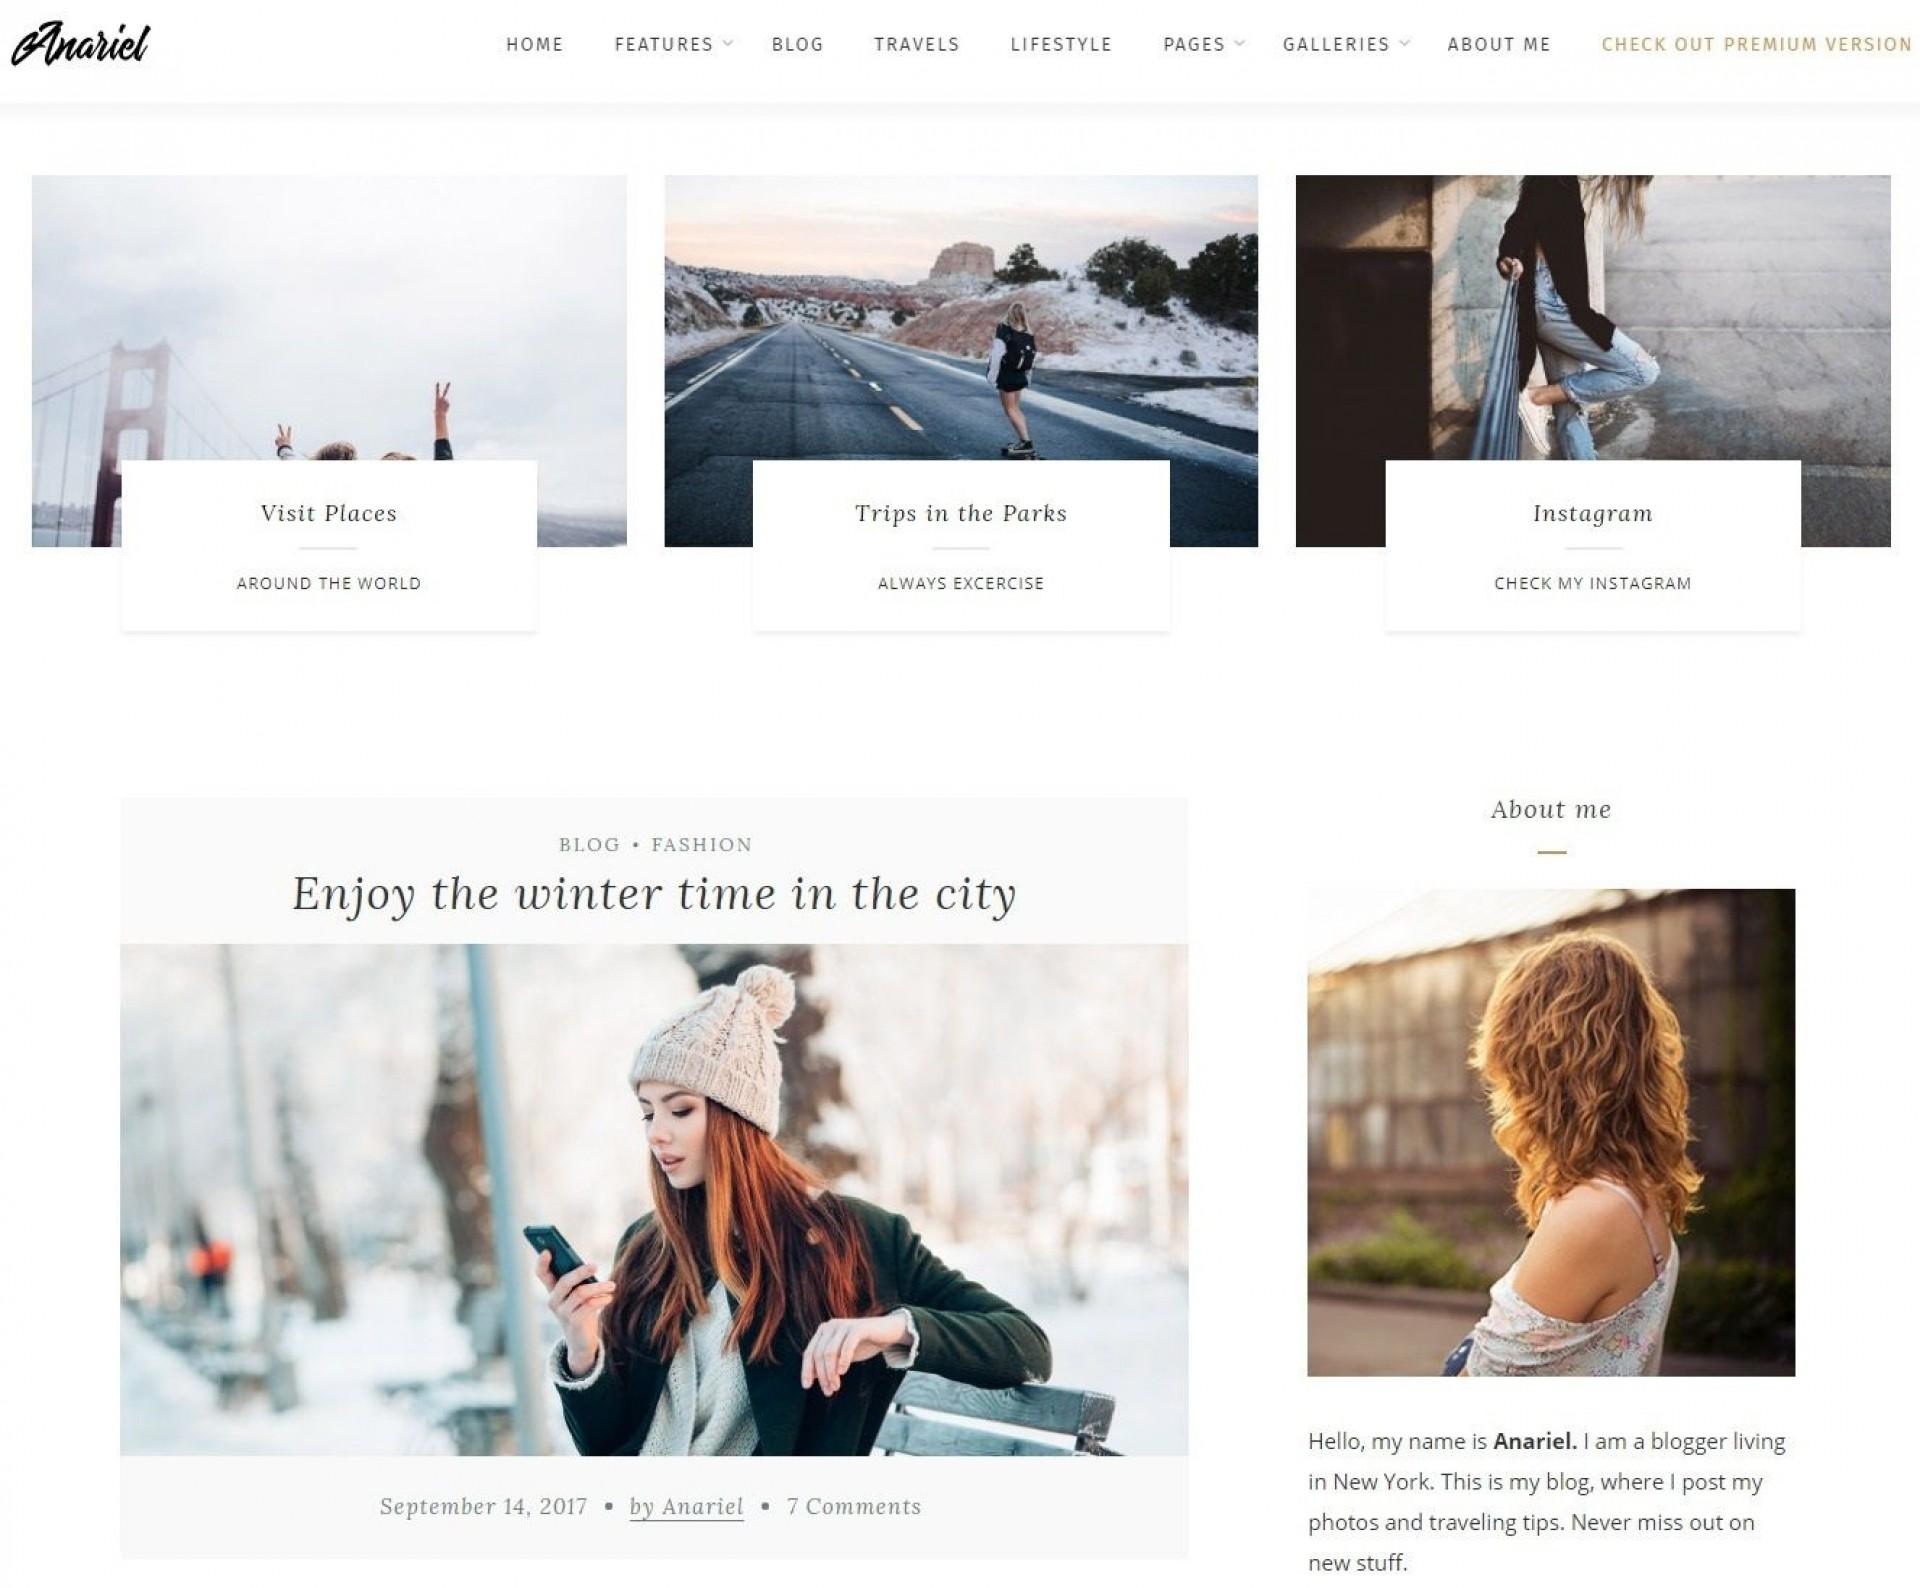 007 Staggering Free Blog Template Wordpres Sample  Wordpress Best Travel Theme Food 20201920